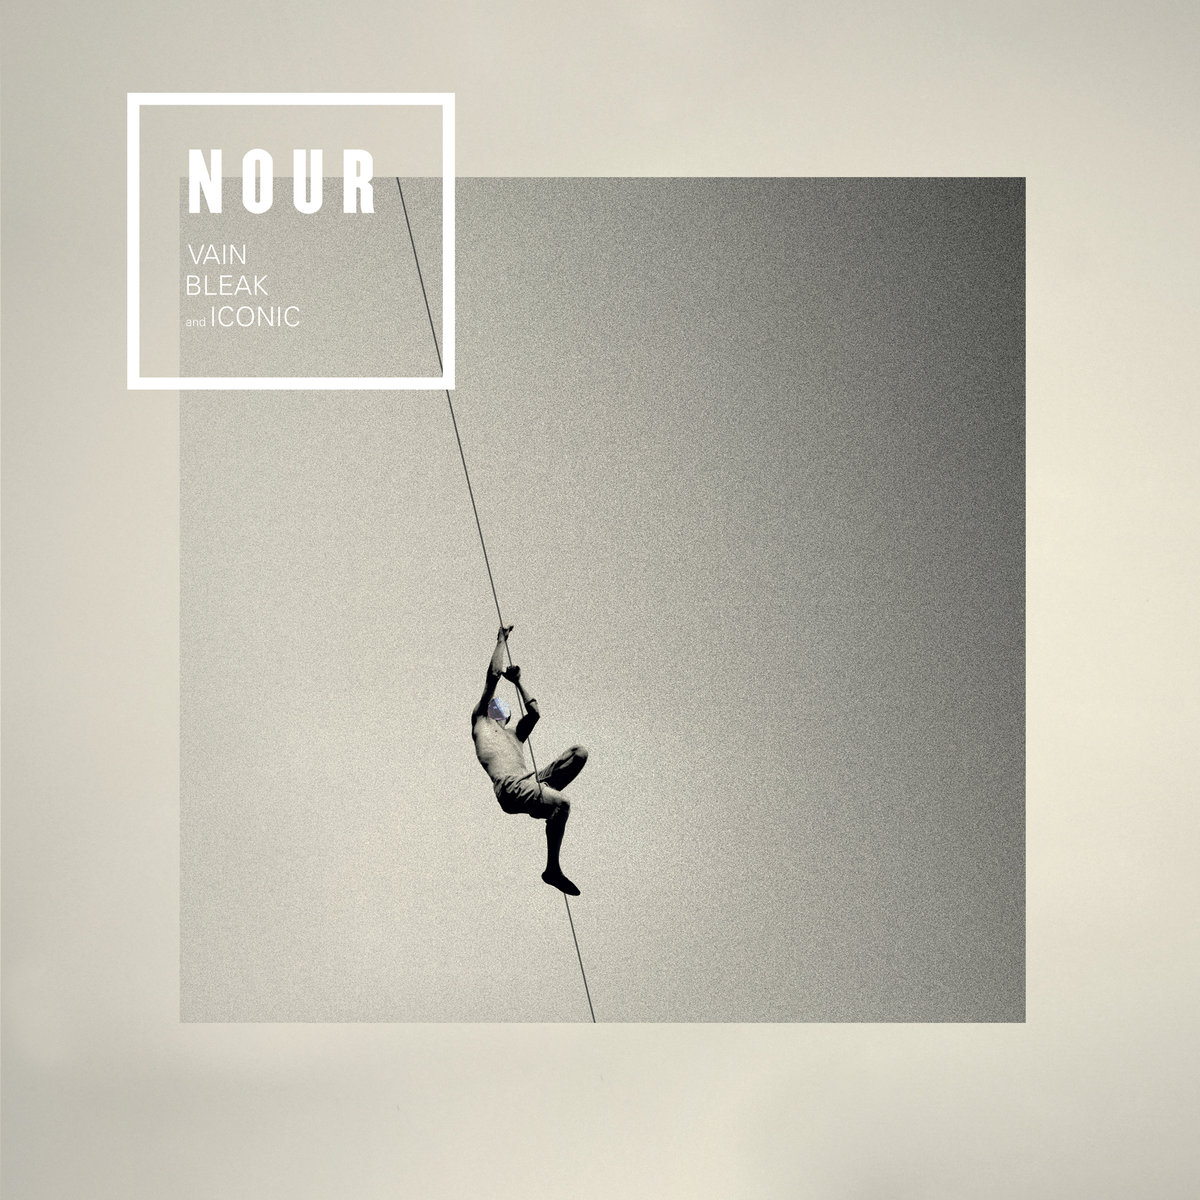 NOUR - Vain Bleak and Iconic